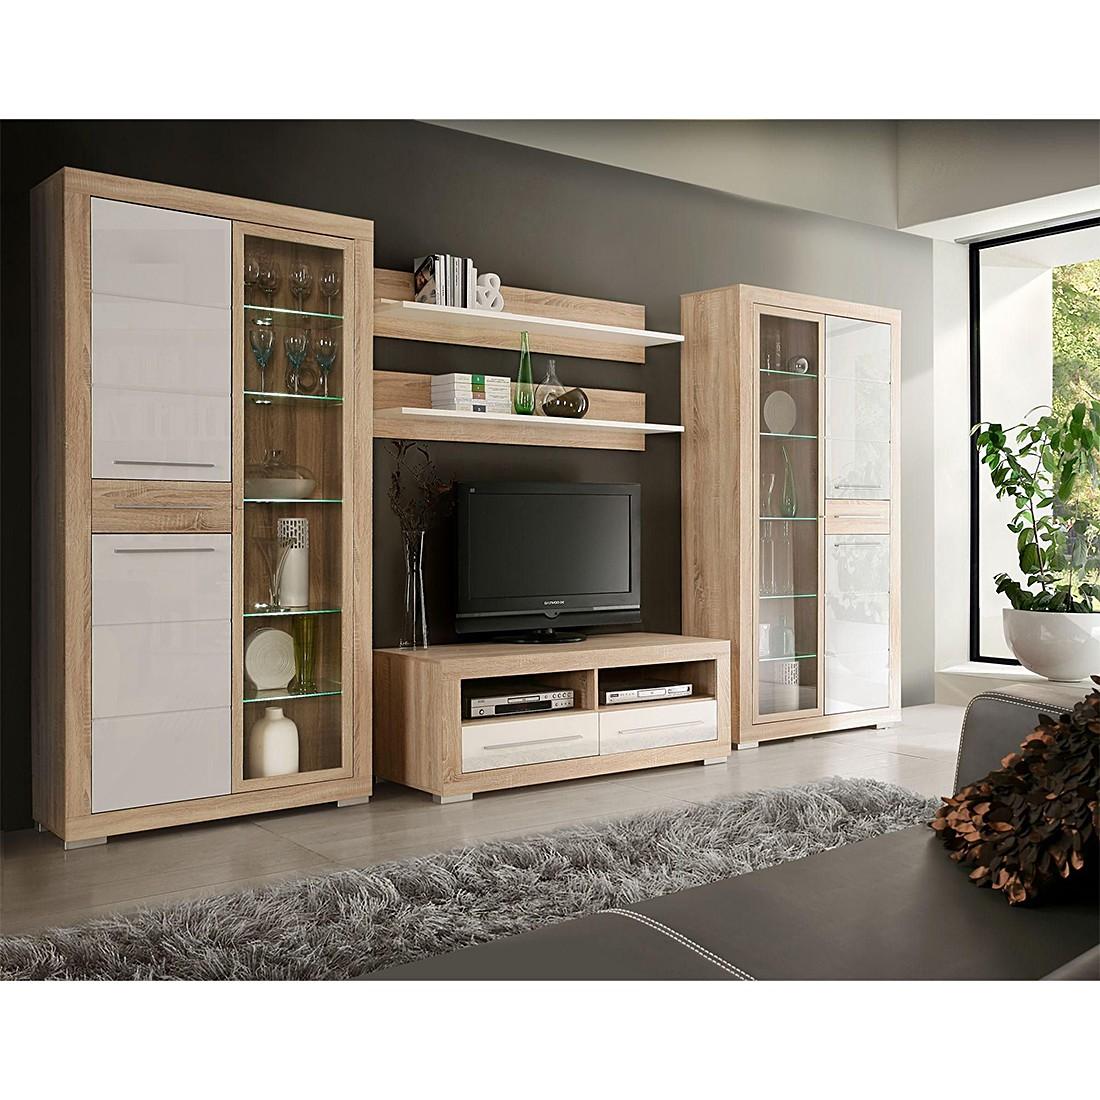 wohnwand hngeschrank interesting hlsta wohnwand. Black Bedroom Furniture Sets. Home Design Ideas